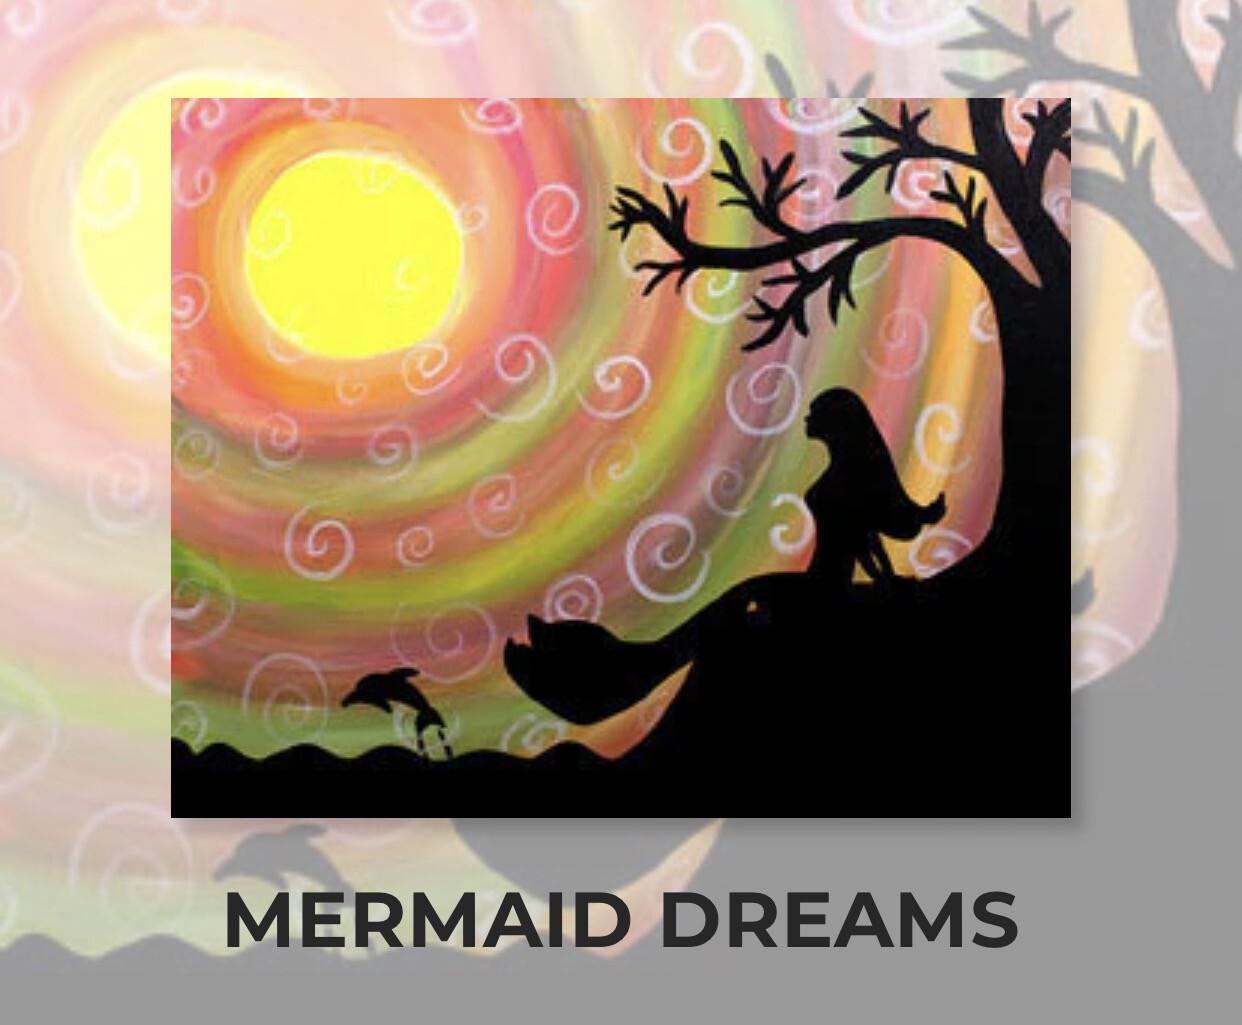 Mermaid Dreams ADULT Acrylic Paint On Canvas DIY Art Kit